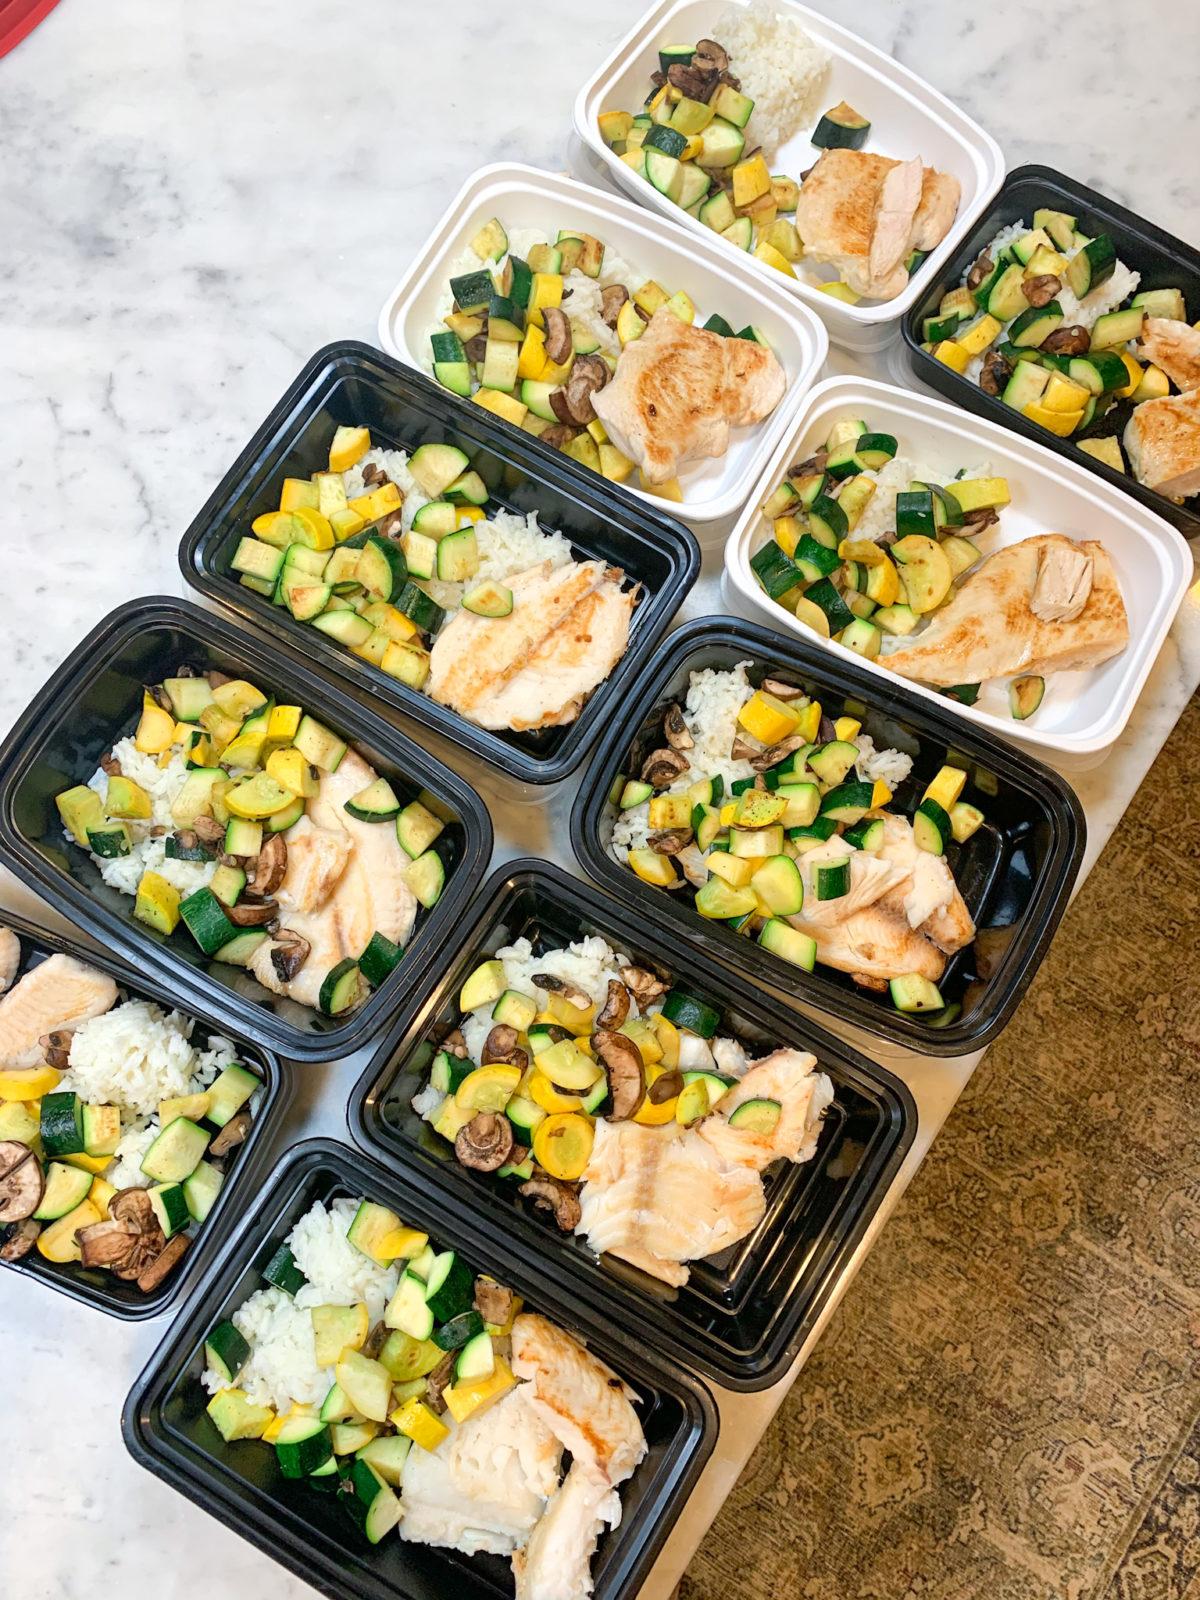 9 Weeks to Beach Body - Meal Prep